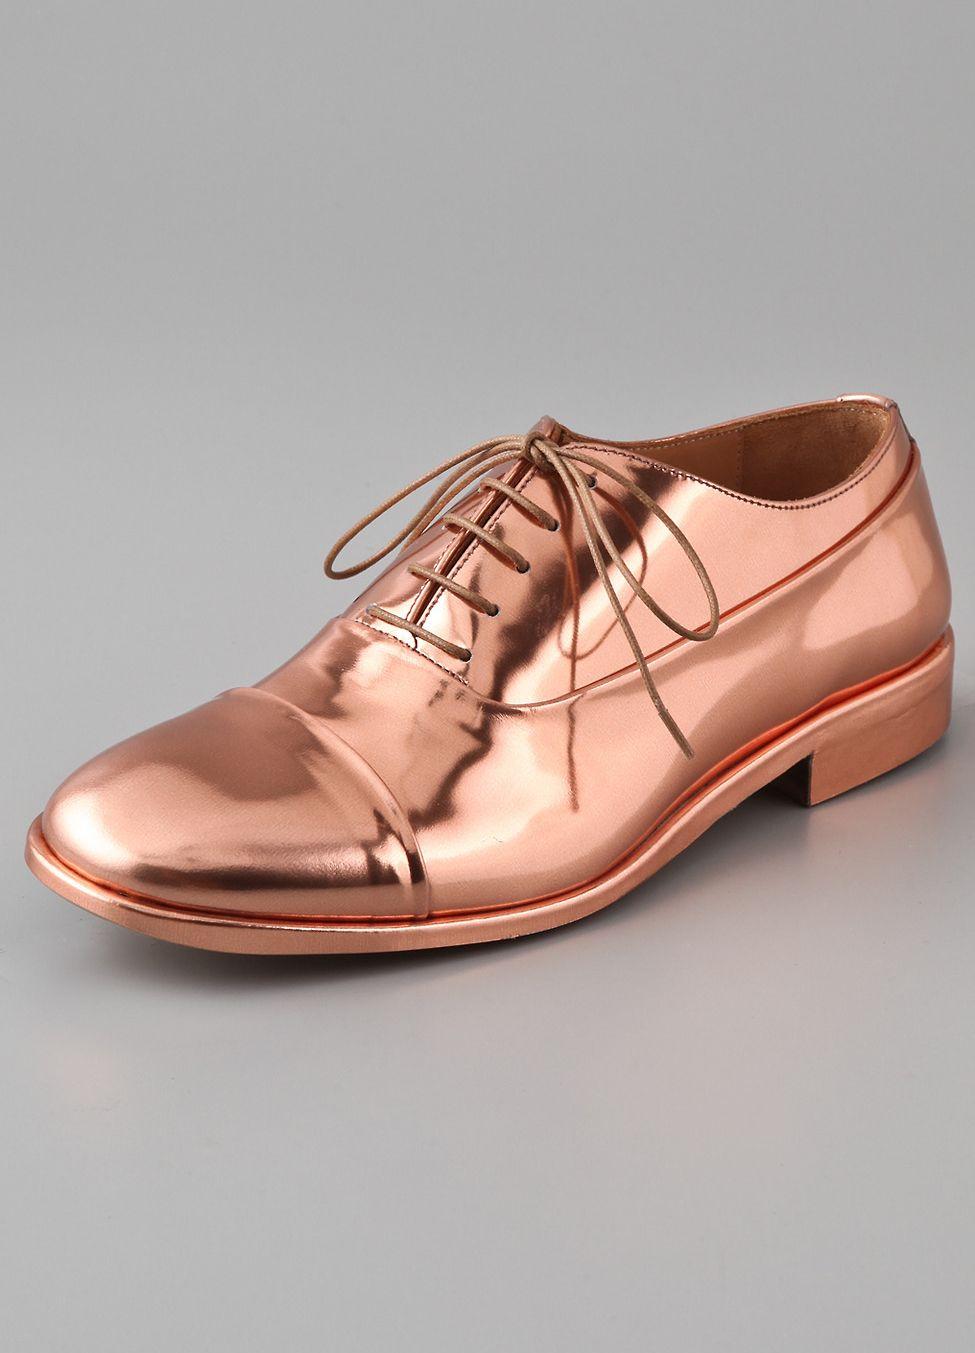 copper lace up dress shoes ~ way cool!